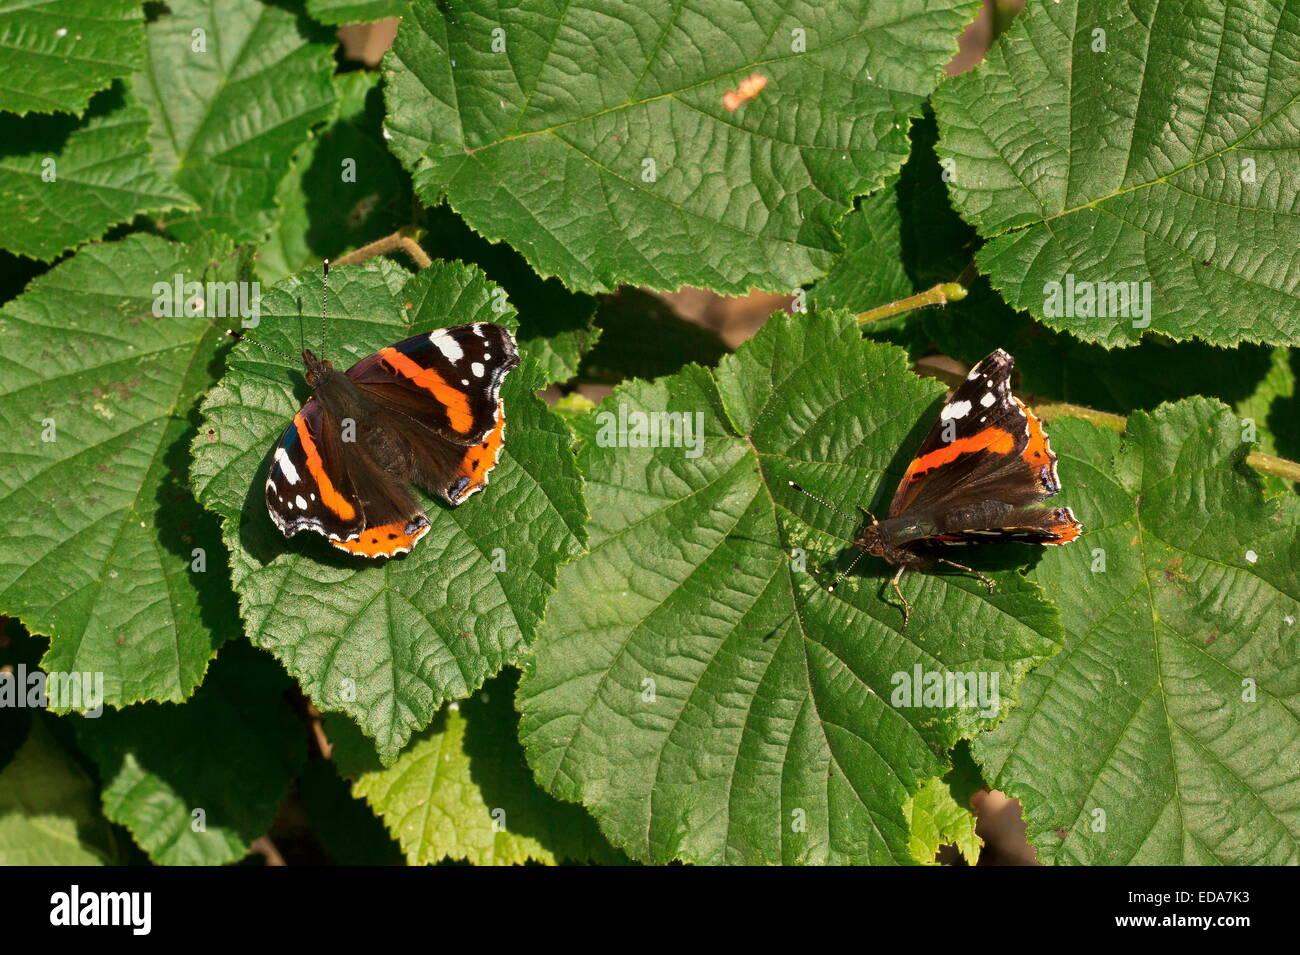 Red Admiral butterflies, Vanessa atalanta, basking in autumn sunshine on hazel leaves. - Stock Image